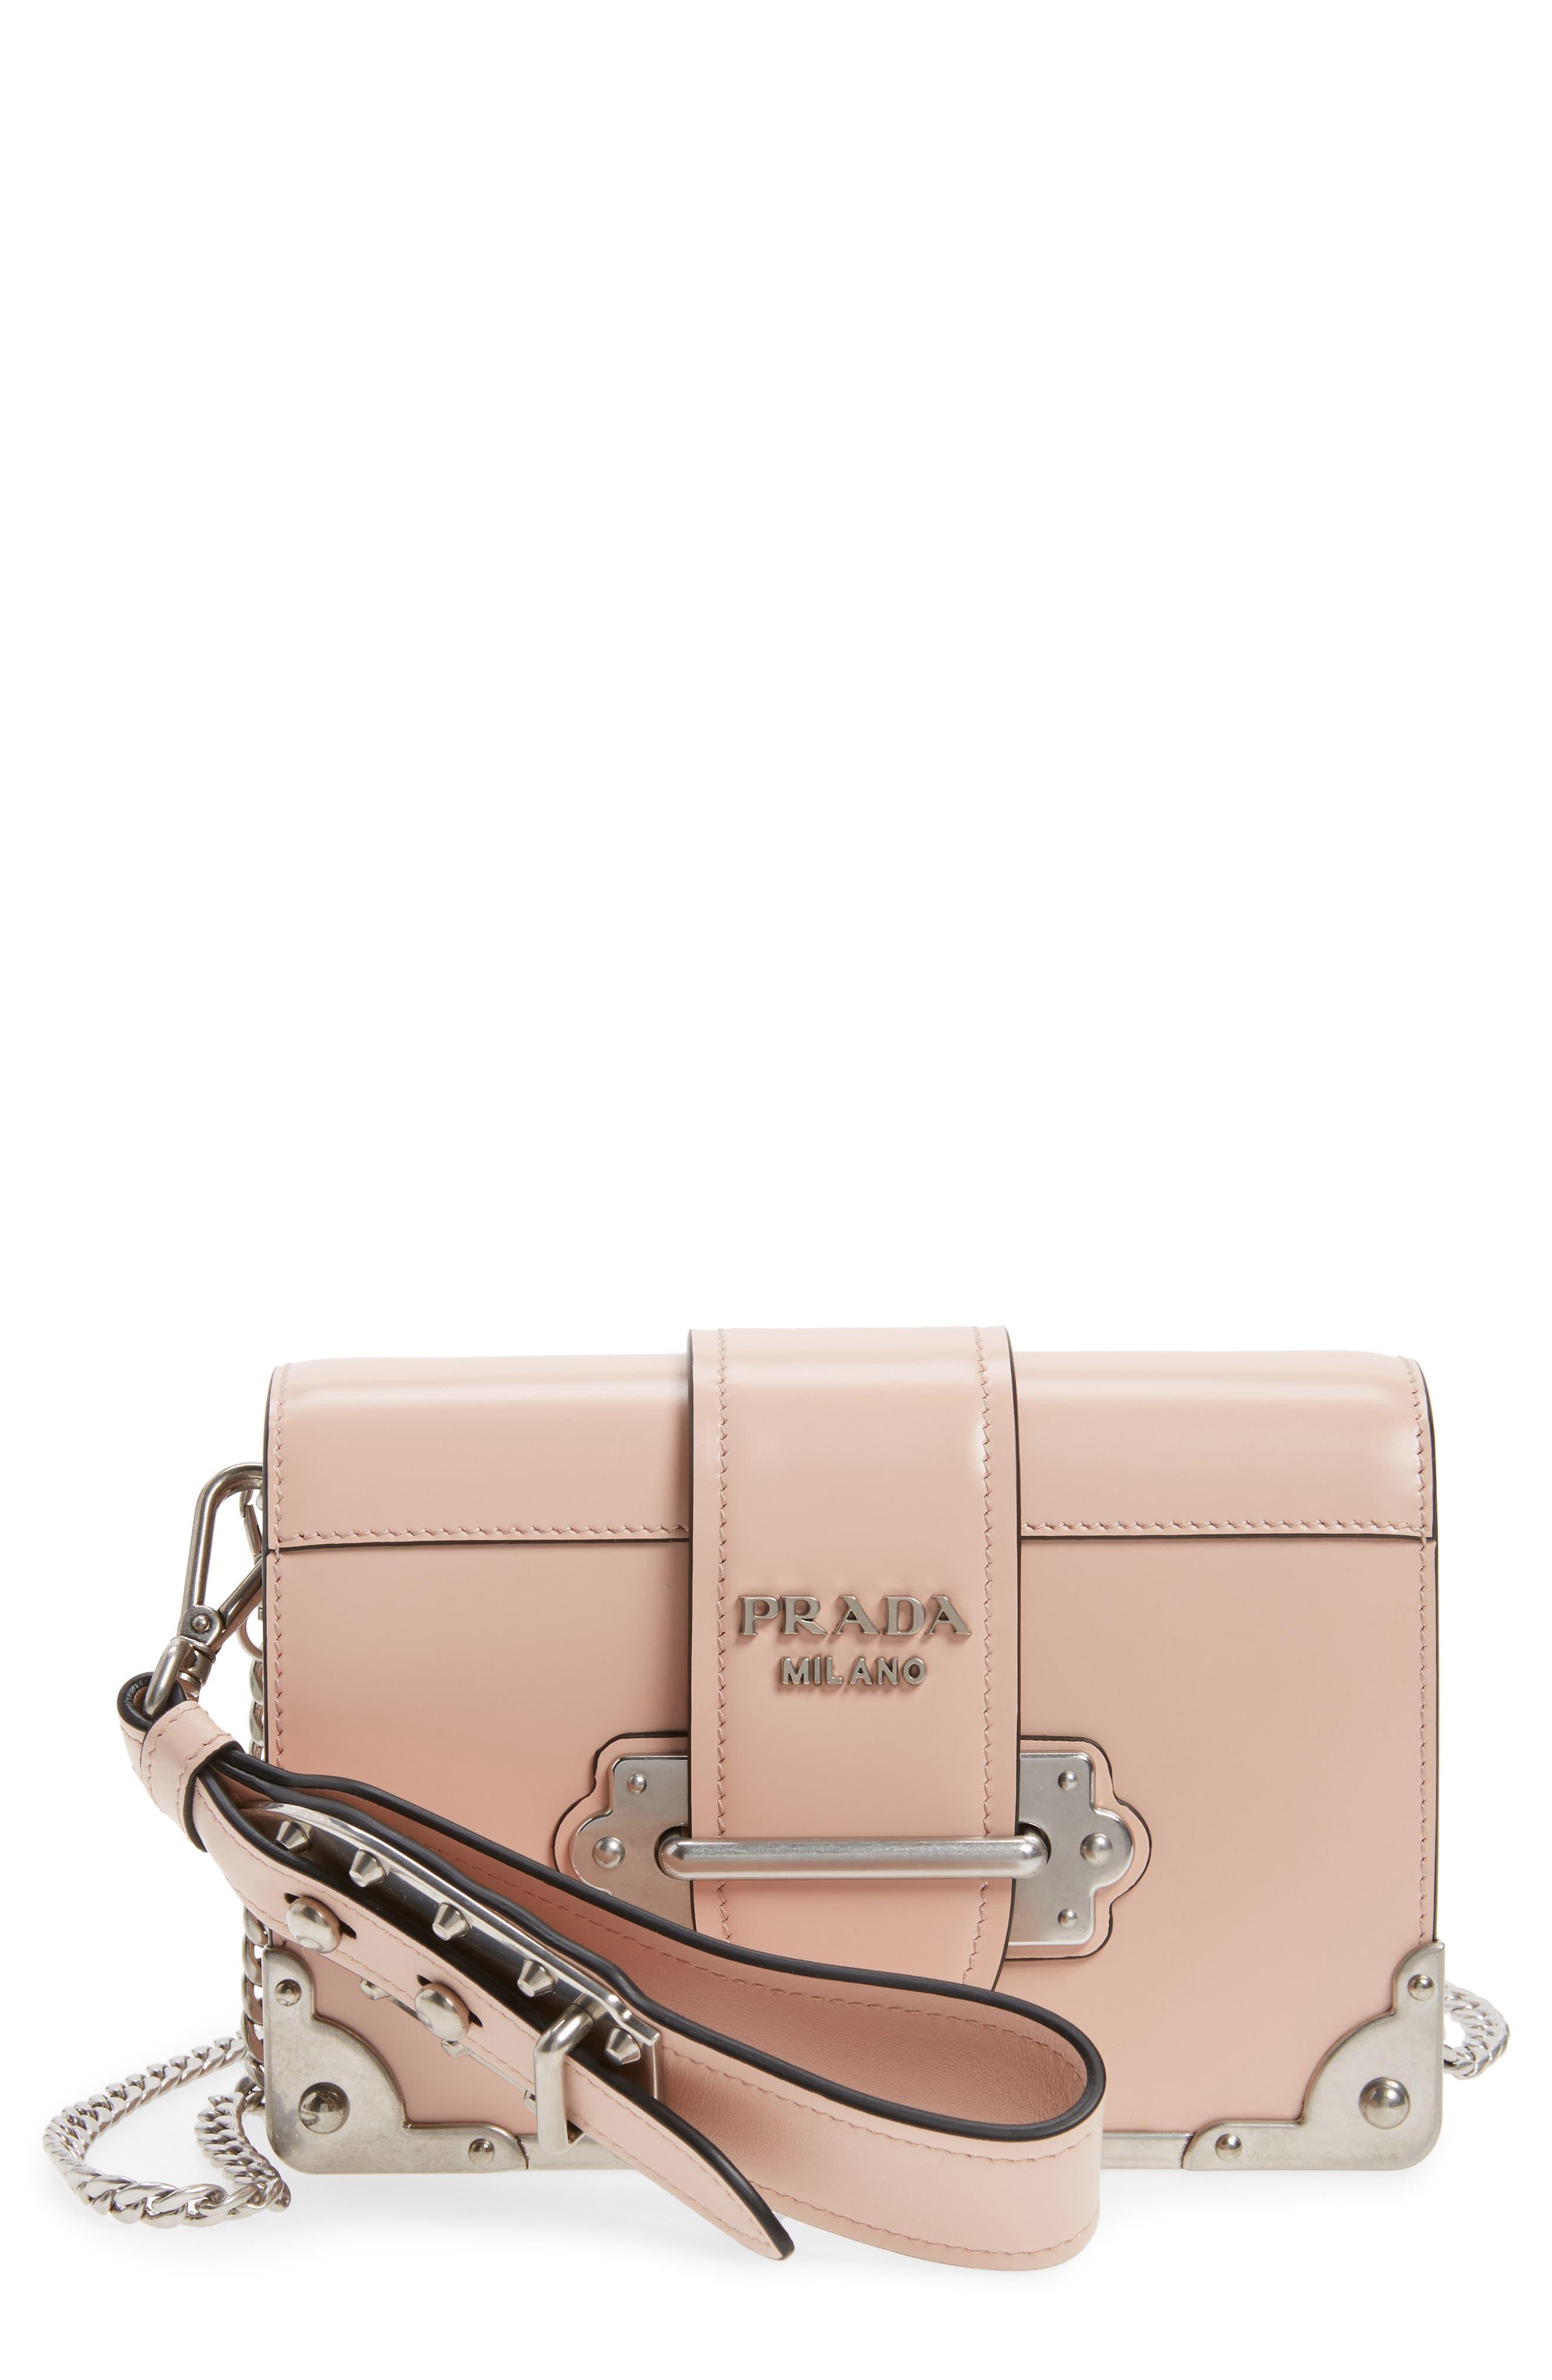 Alternate Image 1 Selected - Prada Small Cahier Leather Shoulder Bag